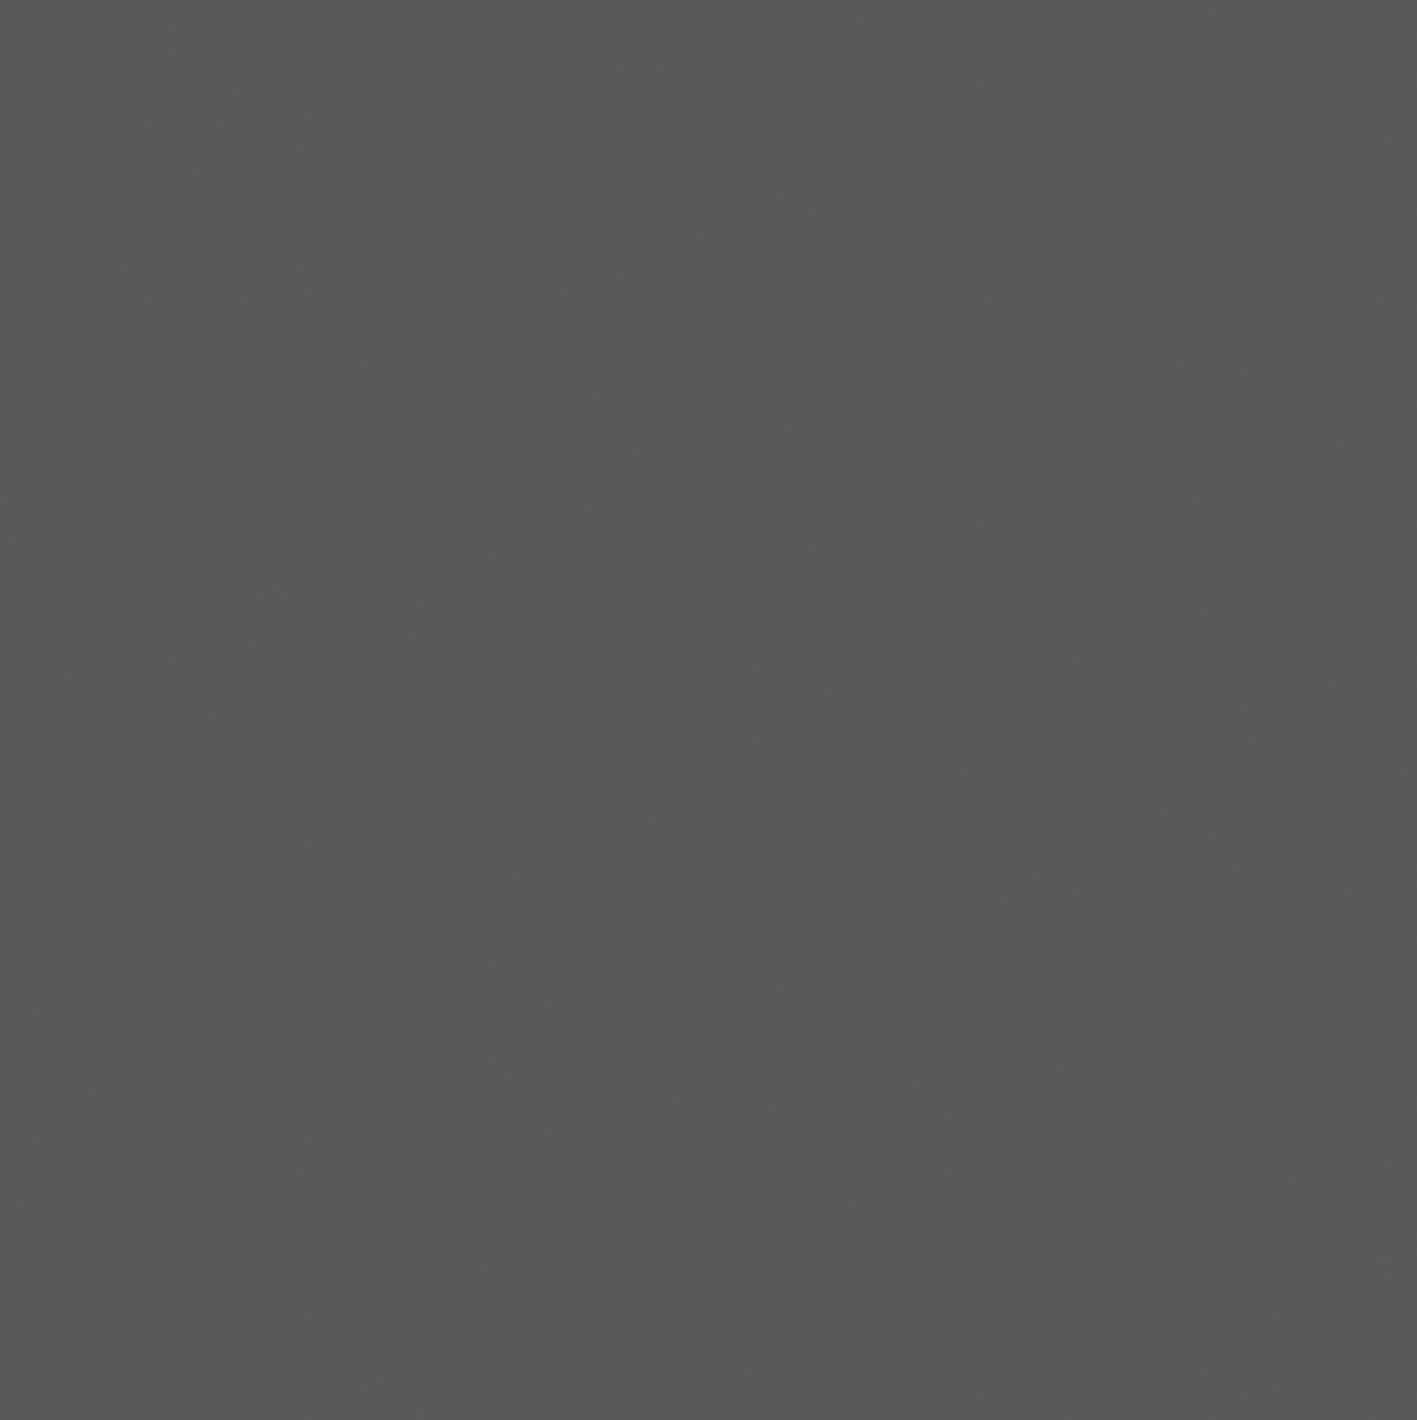 Crayons of Cerim Mist Matte 6mm 120 x 120